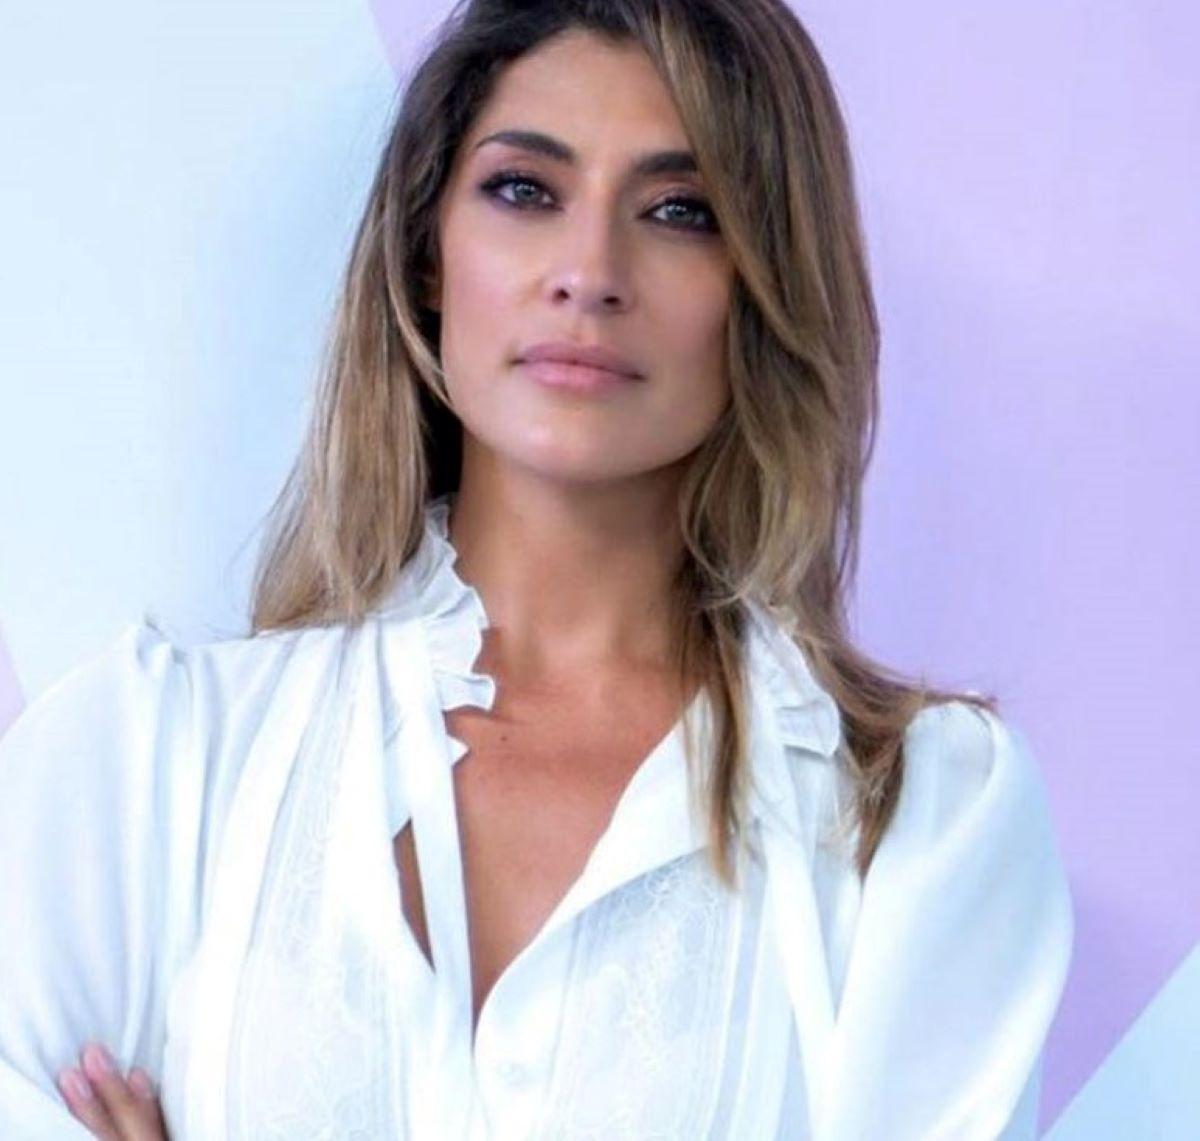 Elisa Isoardi Futuro Televisione Nessuna Proposta Rai Mediaset